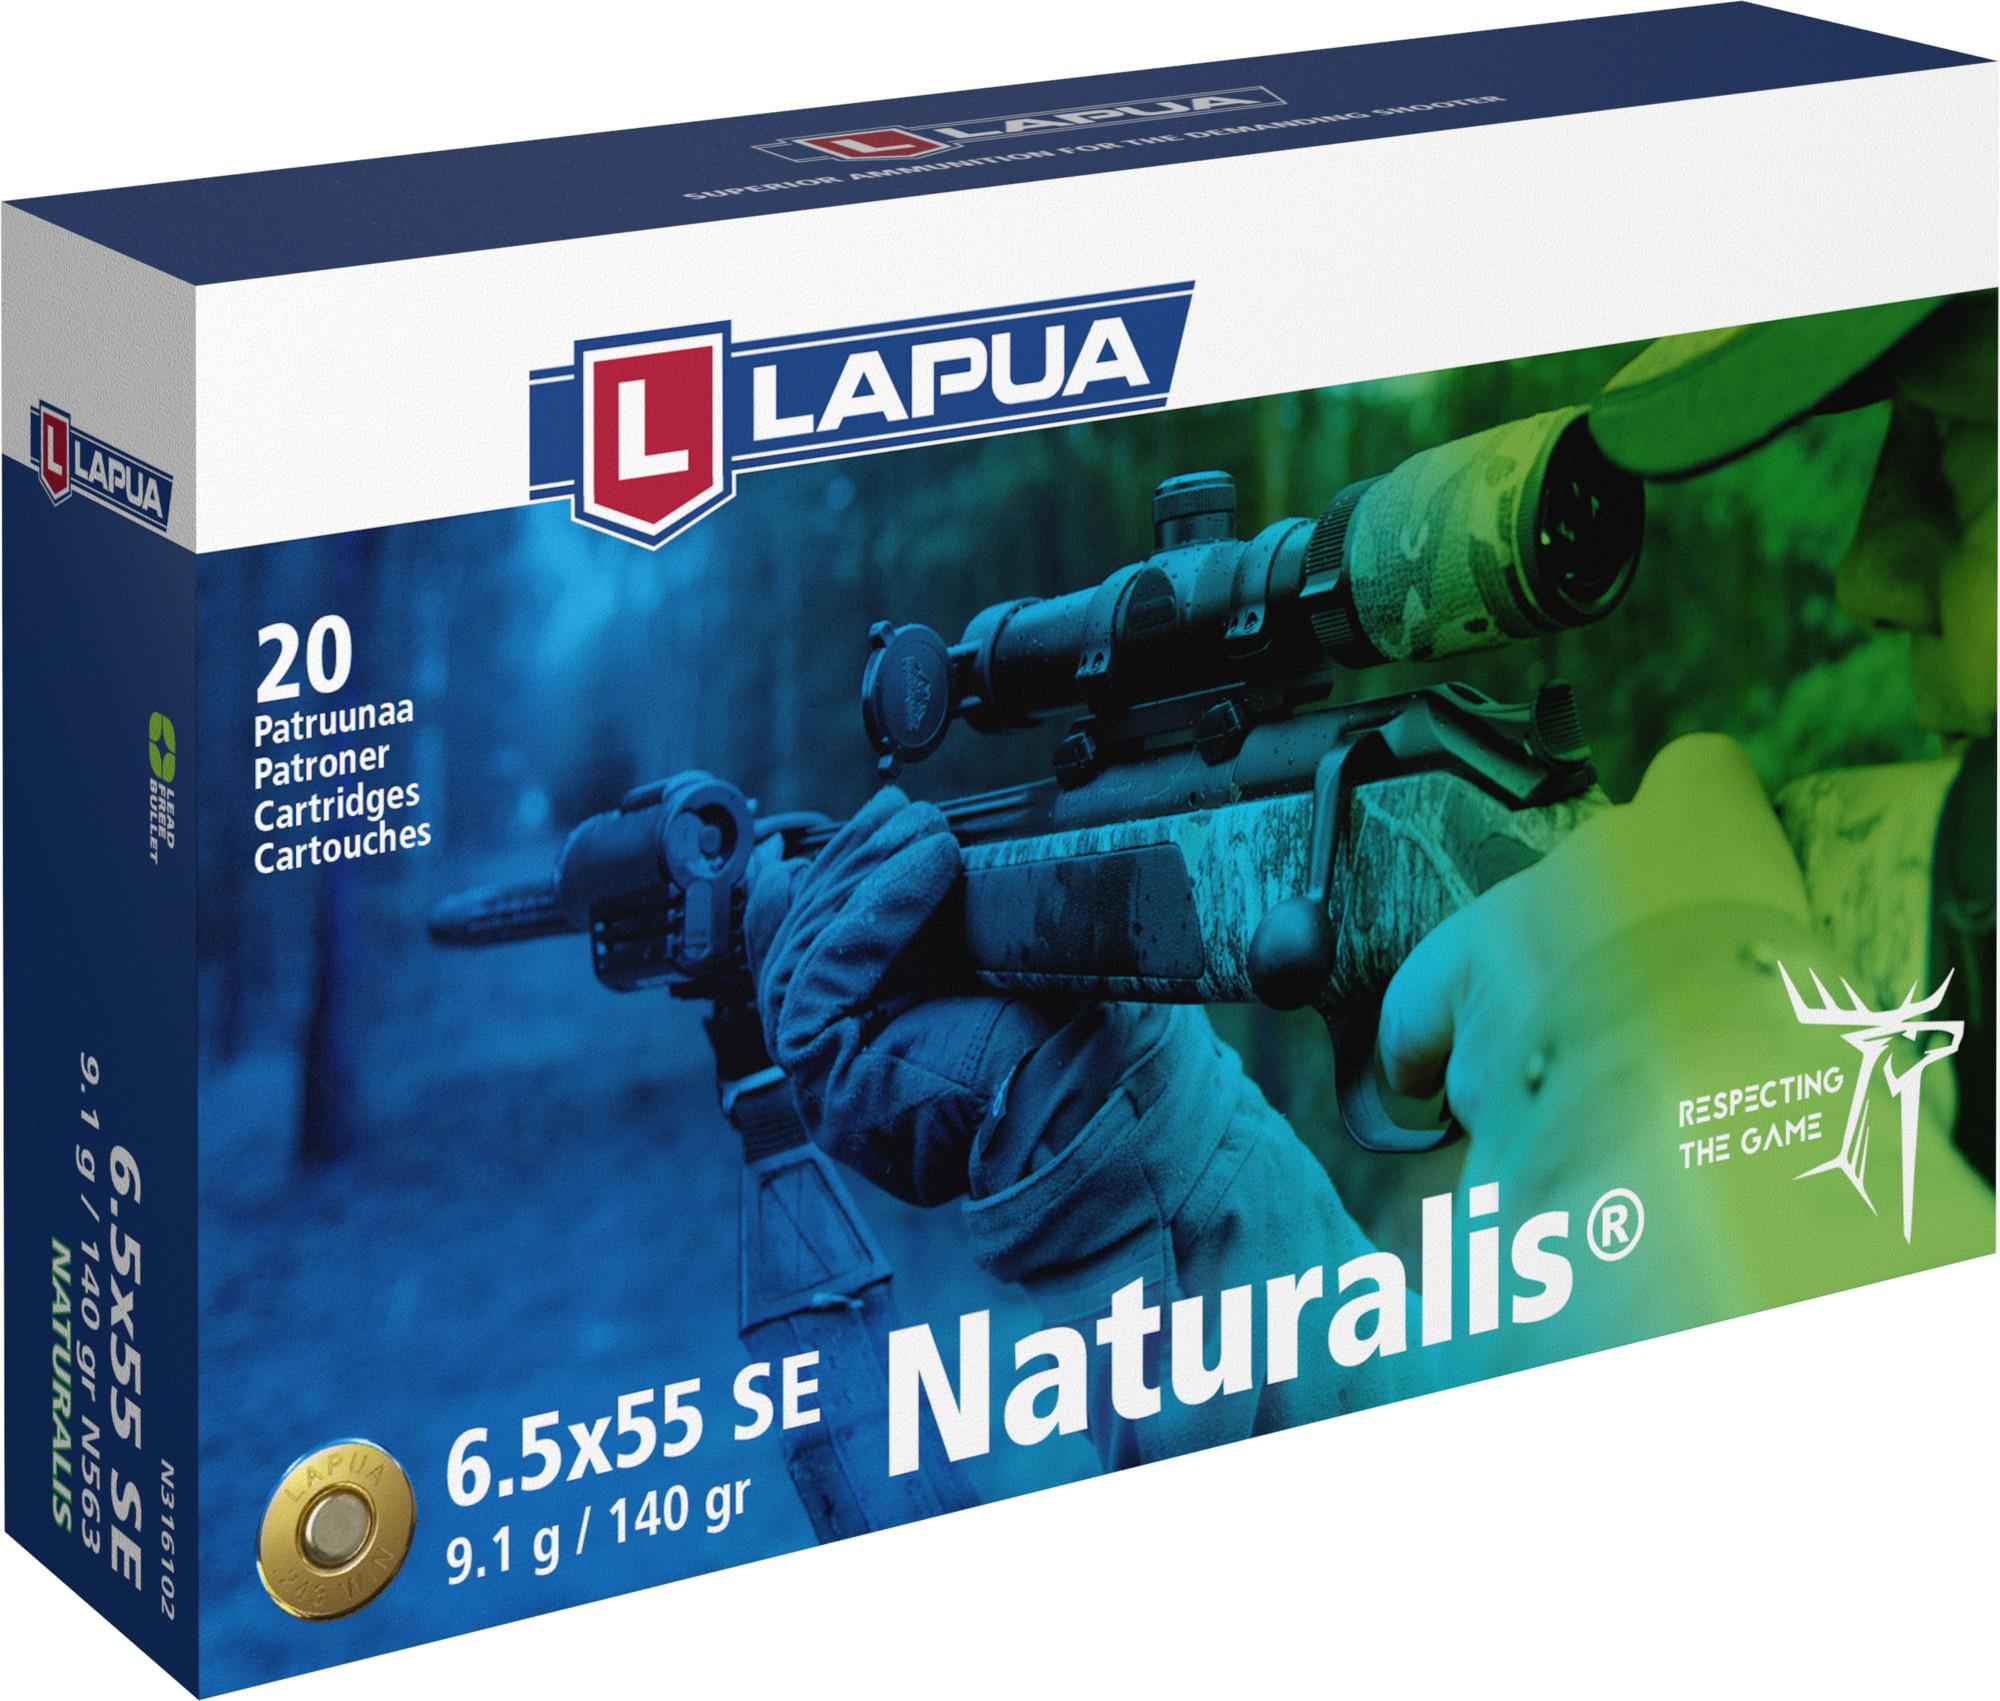 Lapua 6,5x55 SE patruuna Naturalis 9,1g N563 20kpl/rs